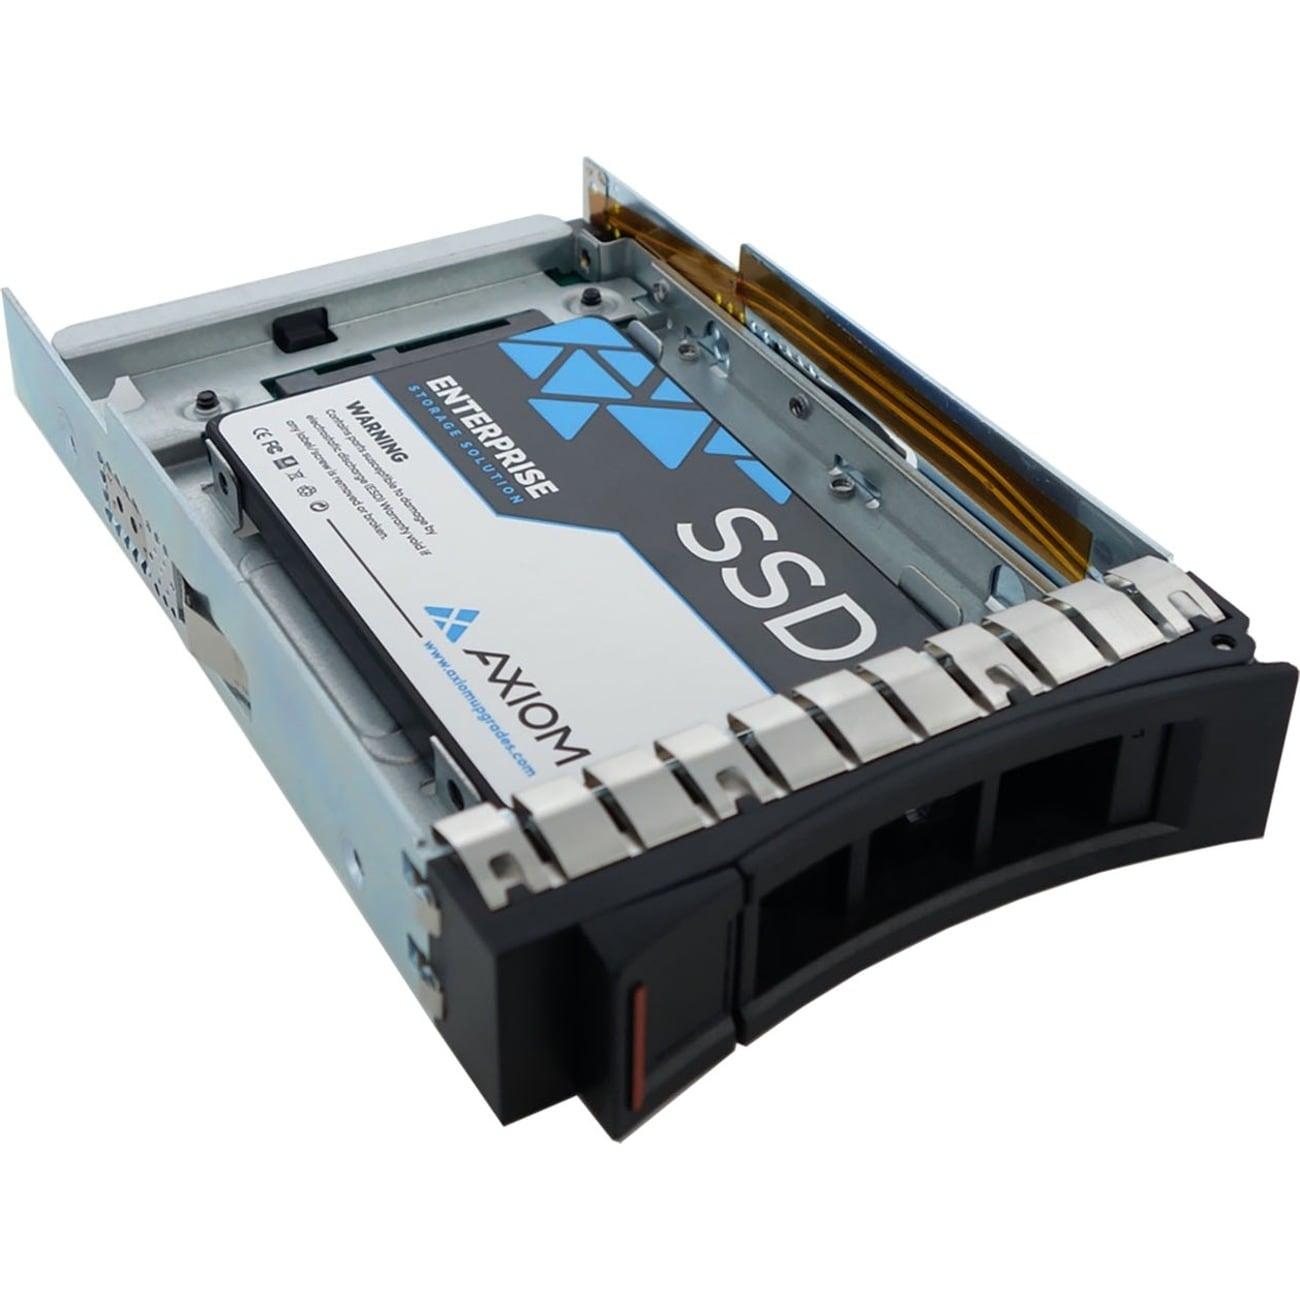 "Axiom 480 GB 3.5"" Internal Solid State Drive #SSDEV20ID48..."